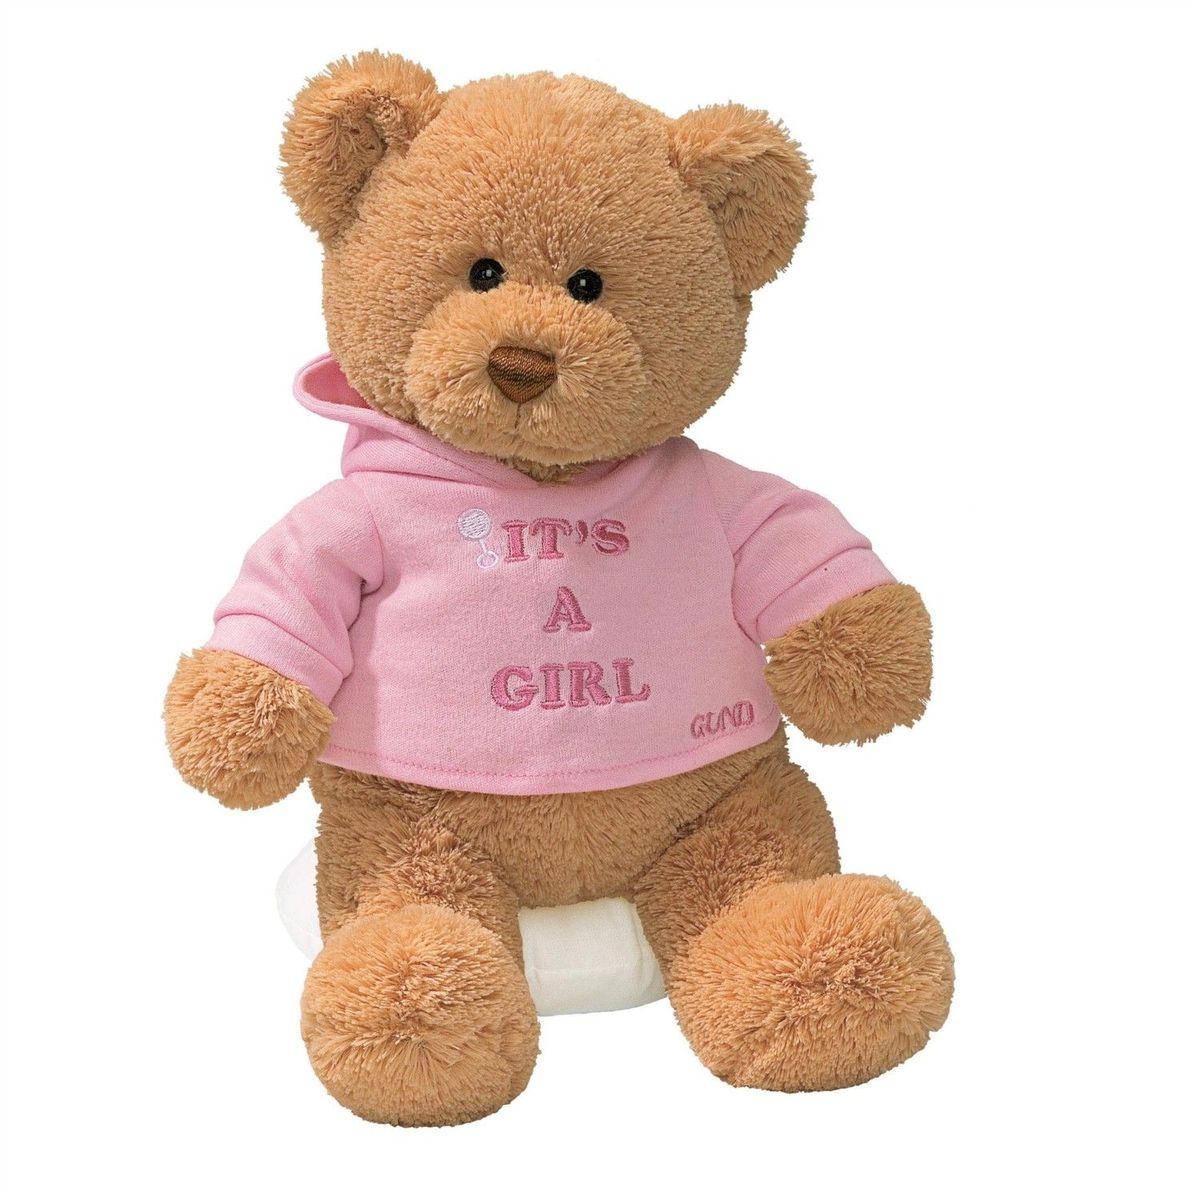 Gund Мягкая игрушка It's a girl 30 см игрушка build a bear студия мягкой игрушки 90303